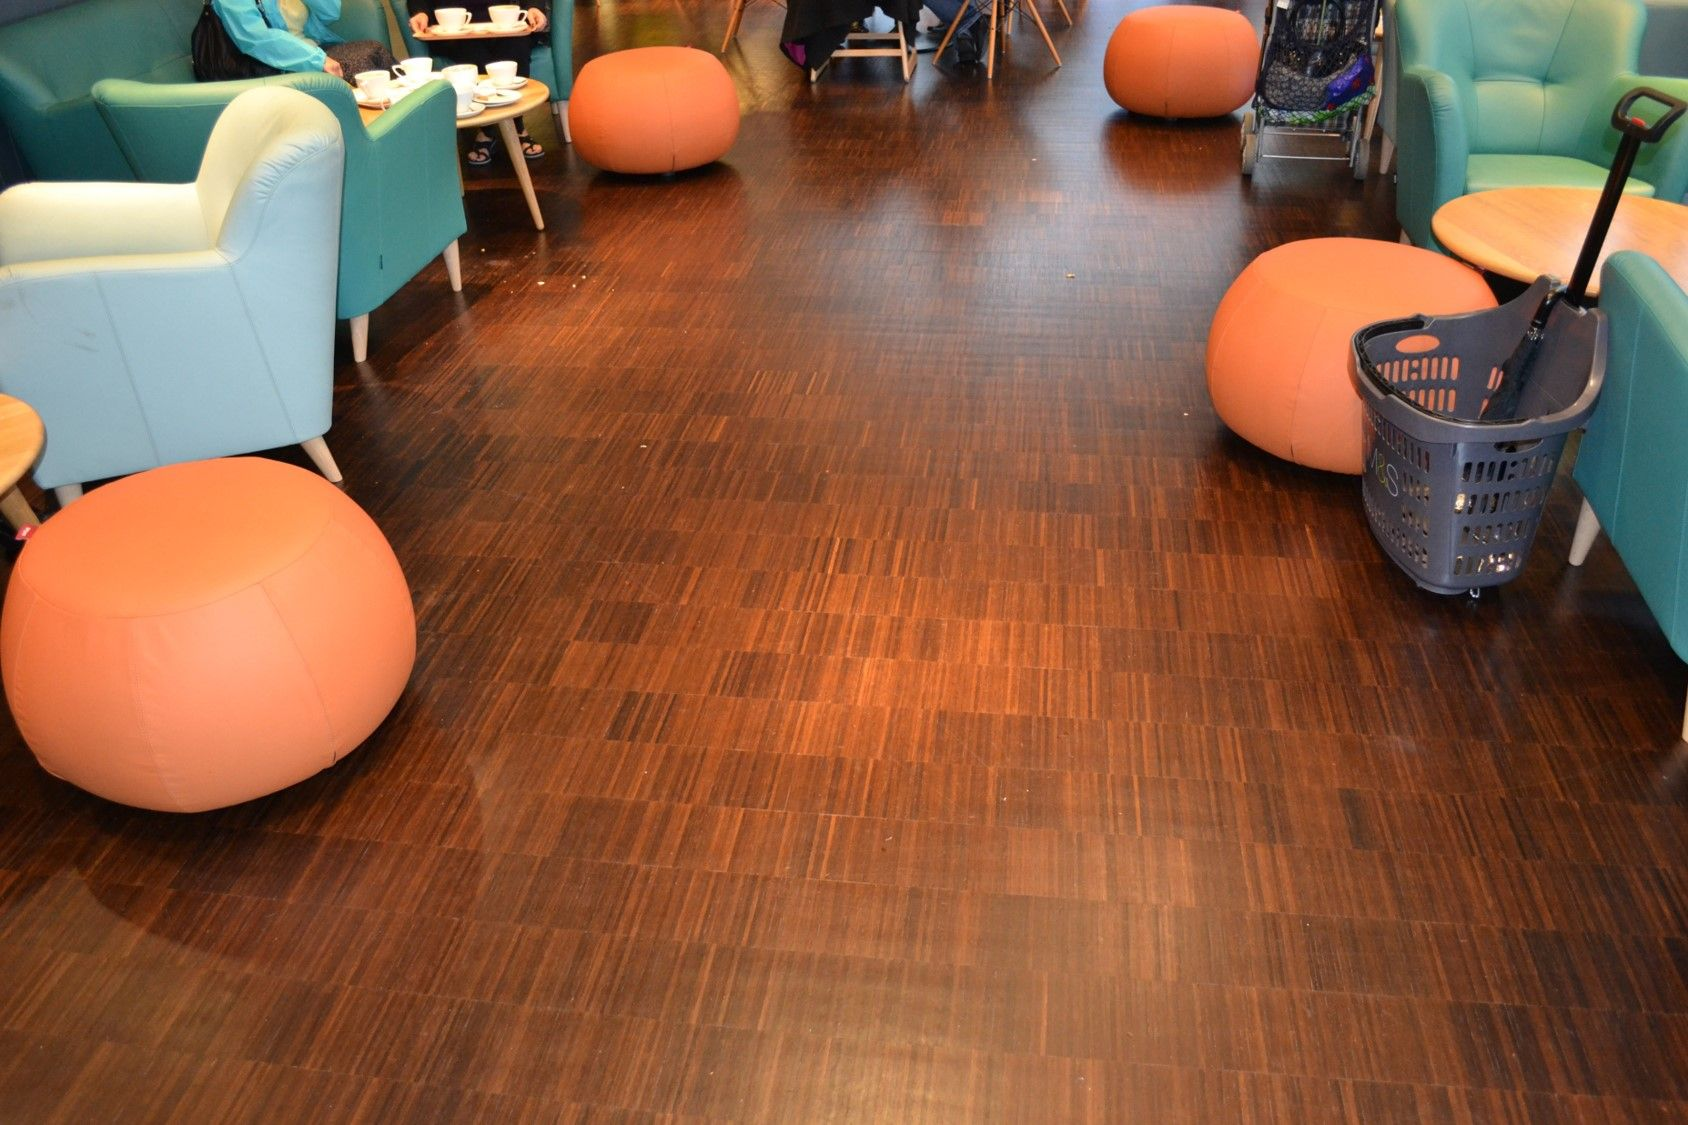 Bamboo Flooring (Caramel) Bamboo flooring, Natural